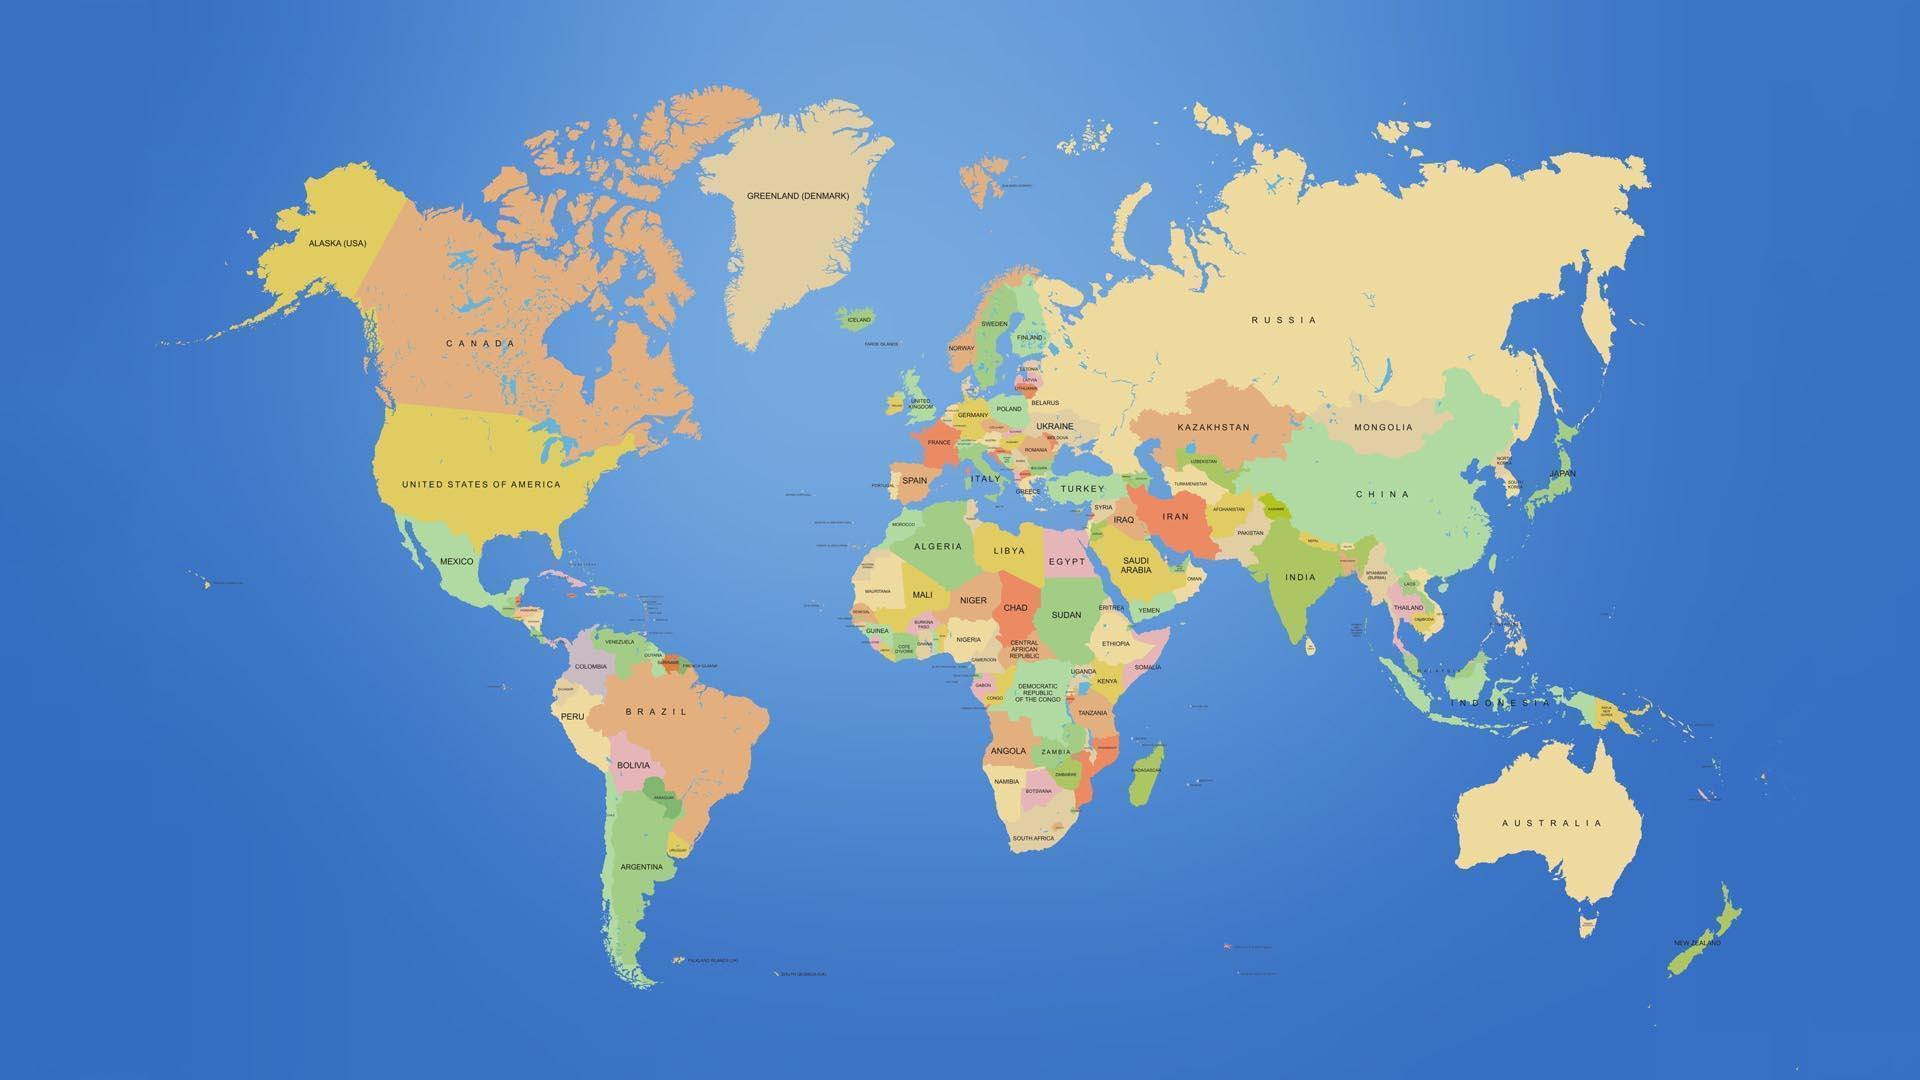 World Map Desktop Backgrounds - Wallpaper Cave